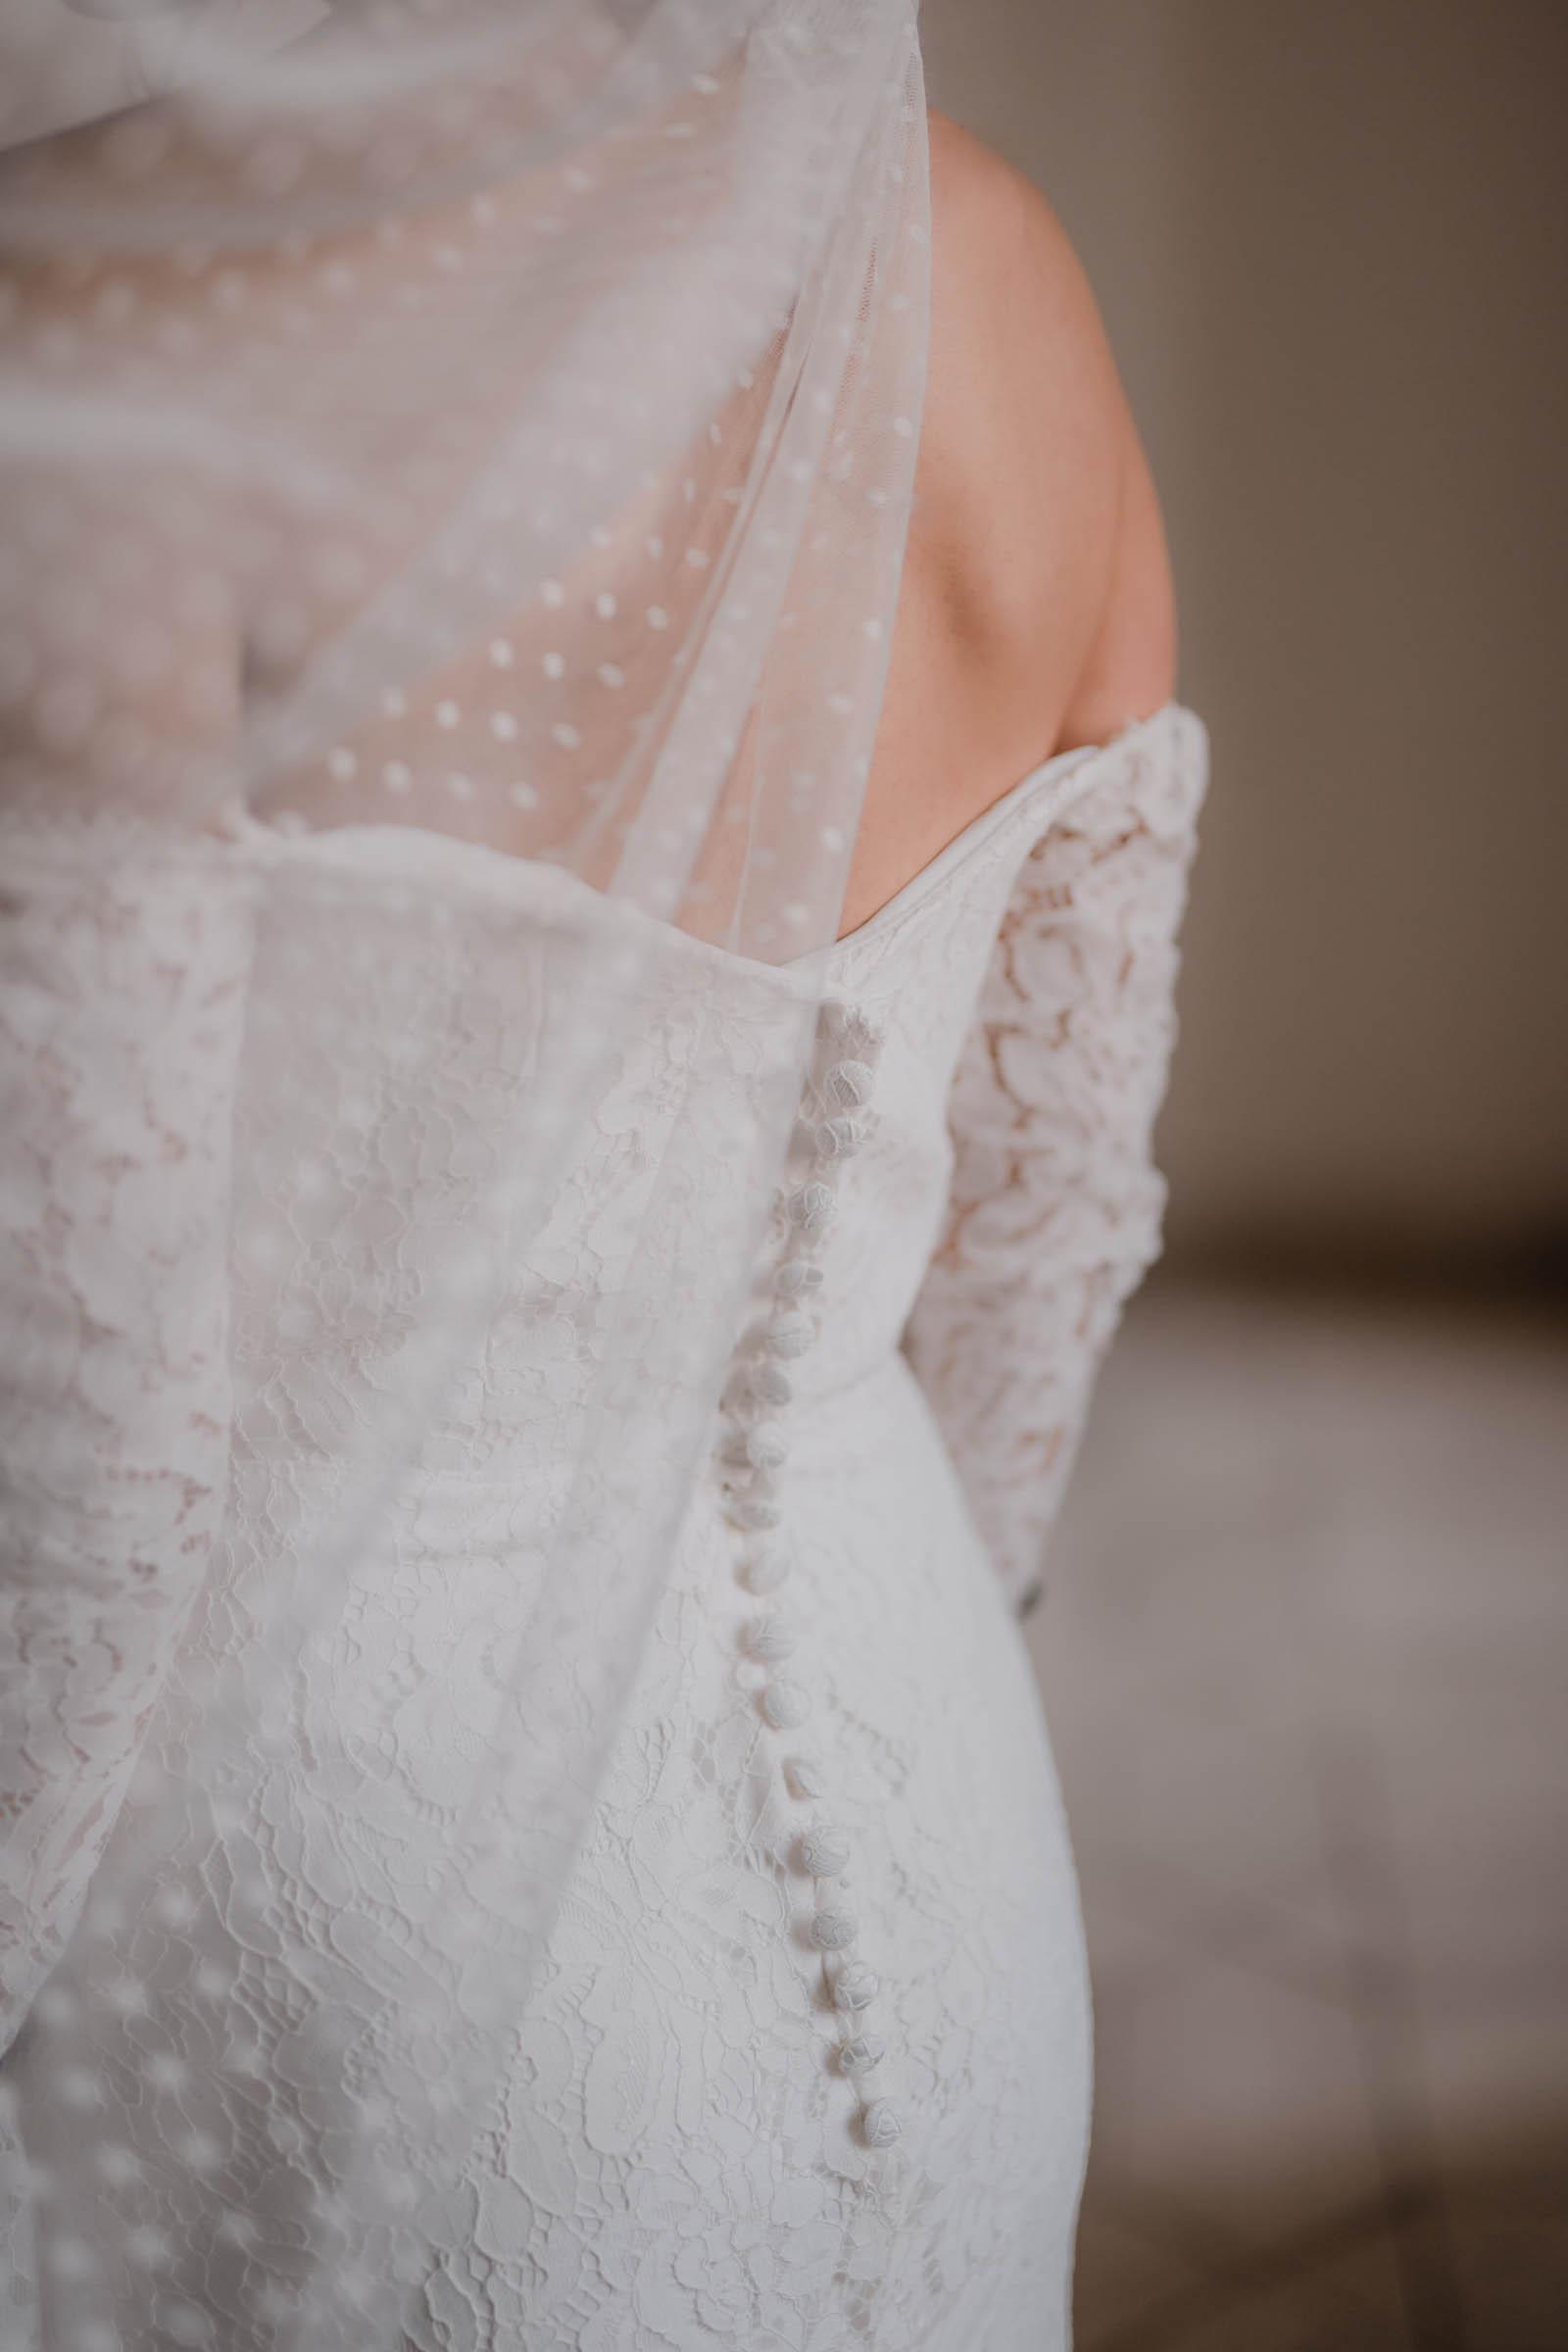 boho-svadobne-saty-veronika-kostkova-wedding-atelier-kolekcia-2019-alba-3